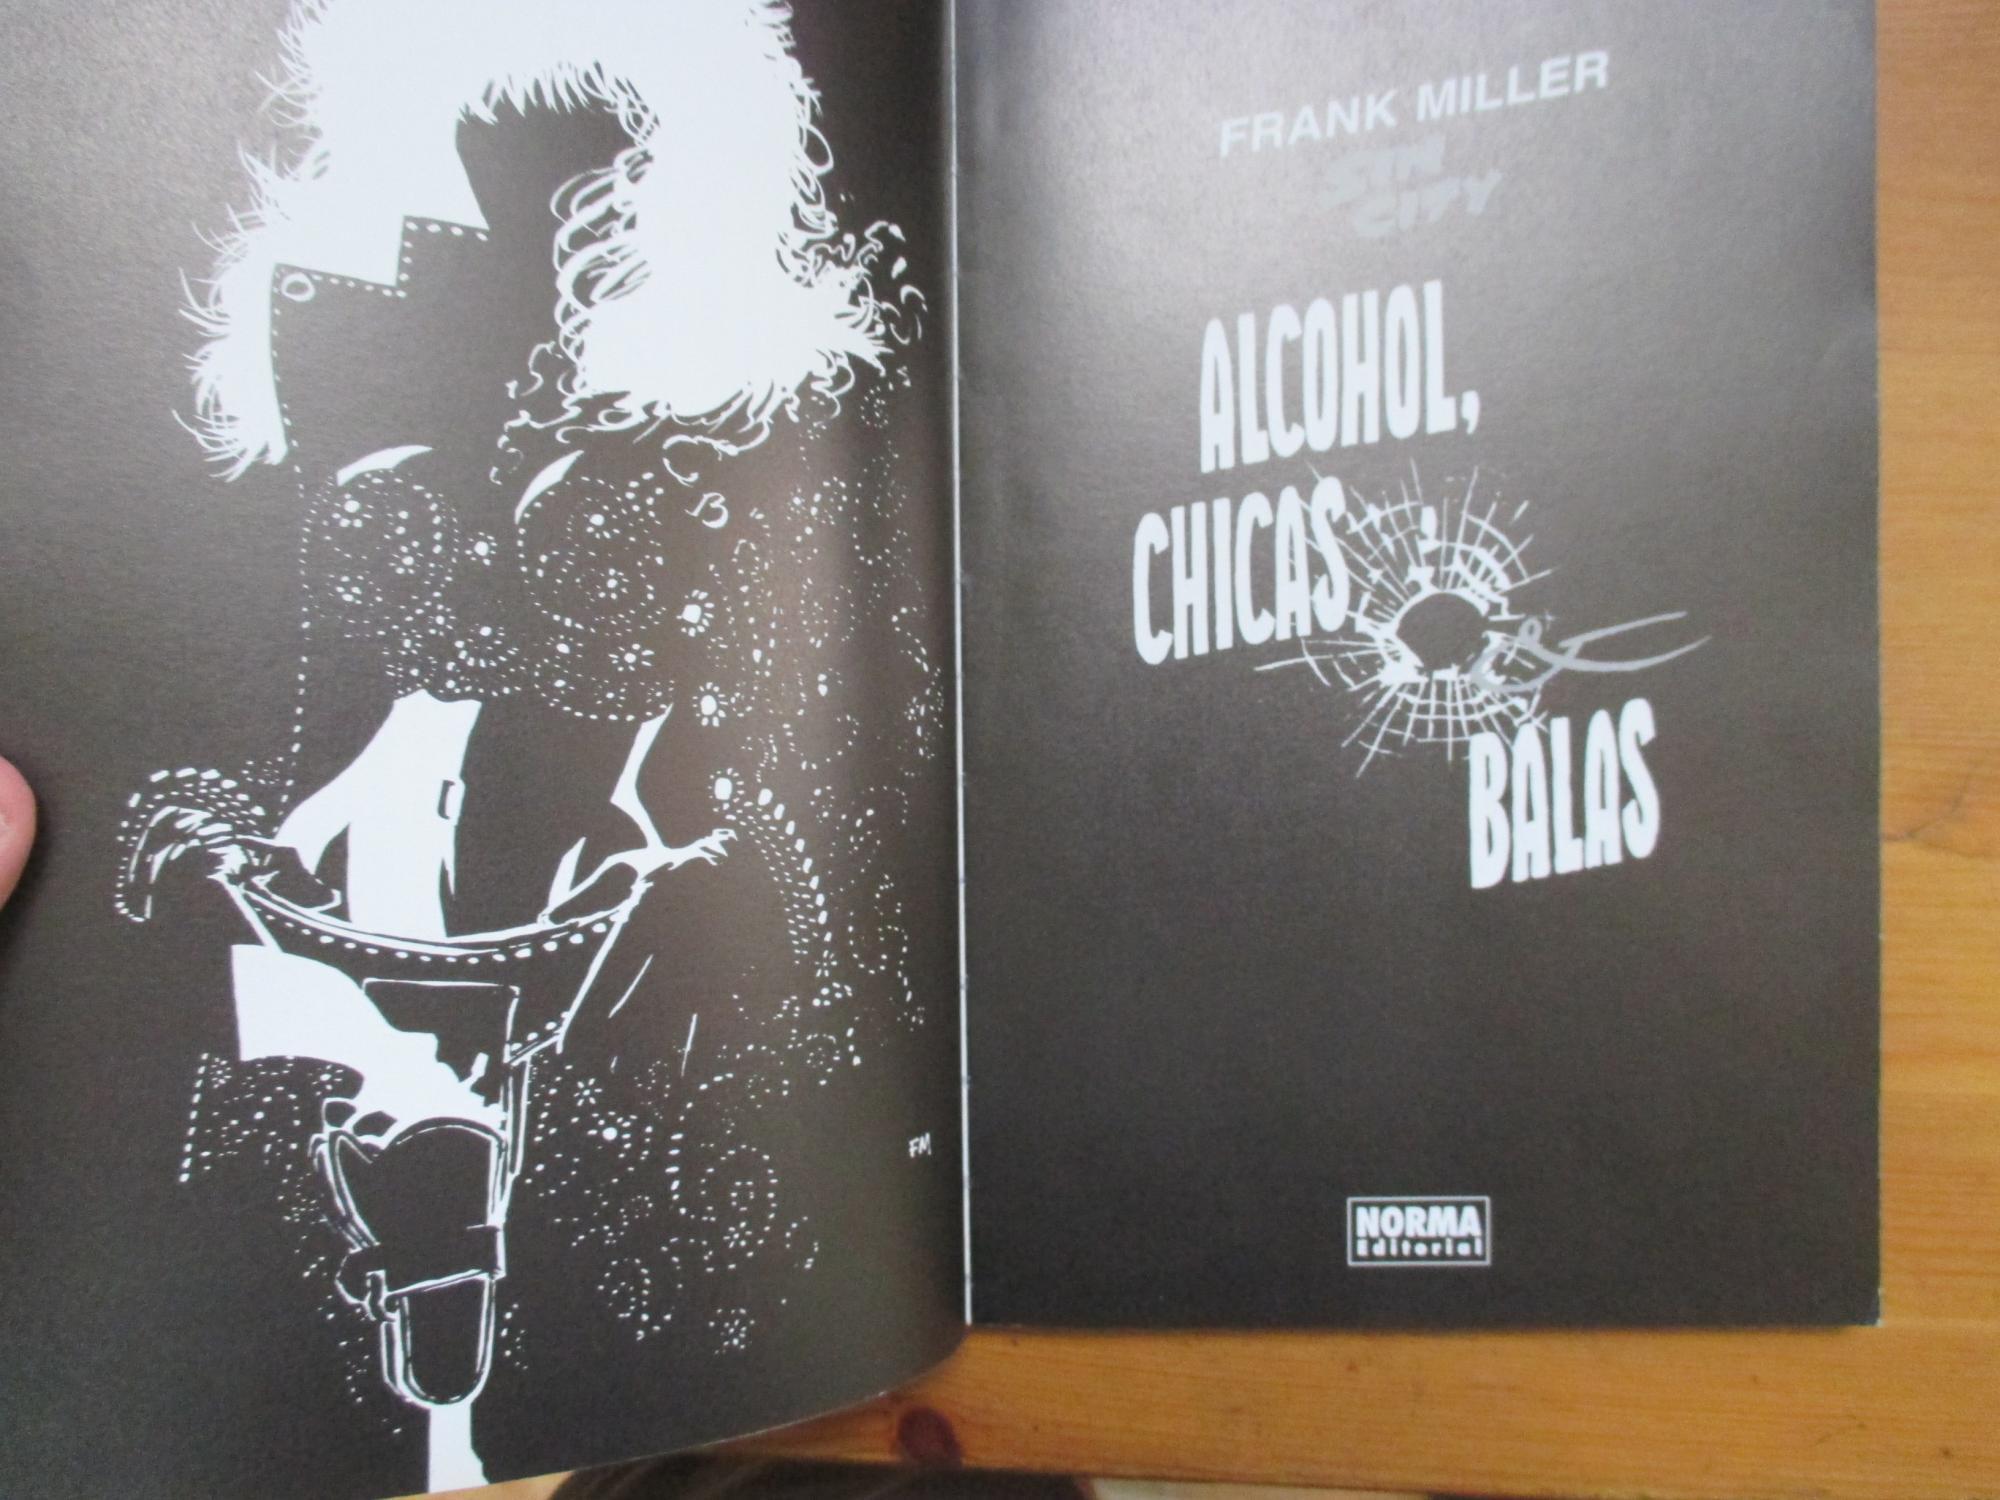 24e2cdd682 Sin City. Alcohol, chicas & balas by Frank Miller: Norma Editorial ...